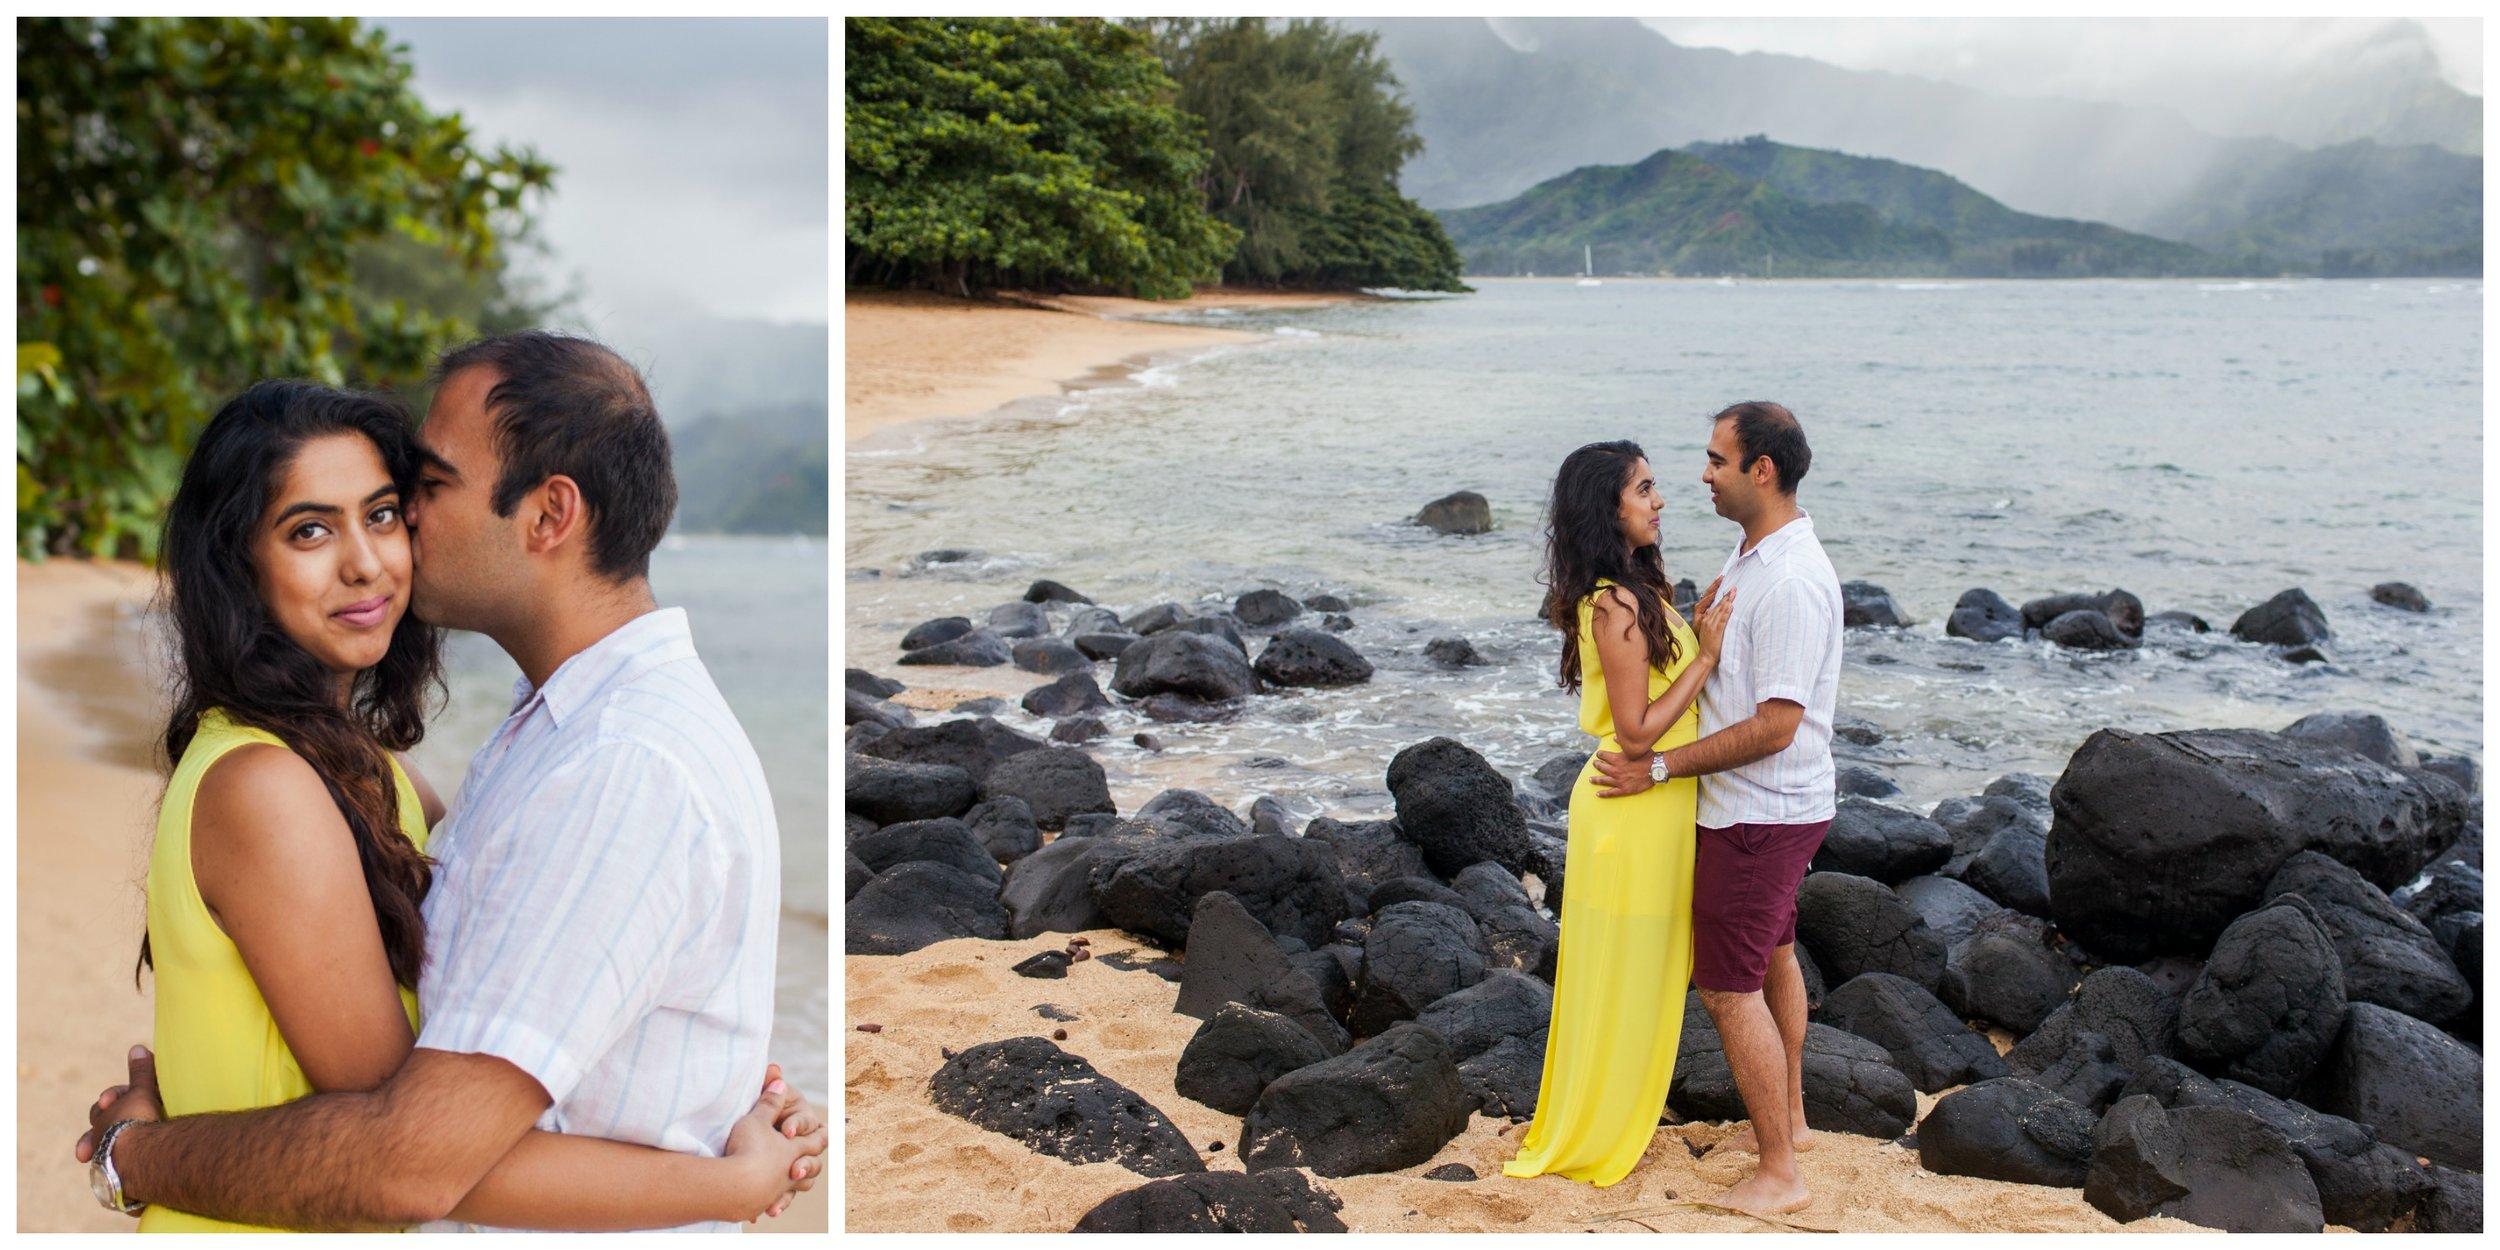 Pacific Dream Photography - Hawaii Photographer - Portrait Photographer - Family Photographer - Kauai Photographer